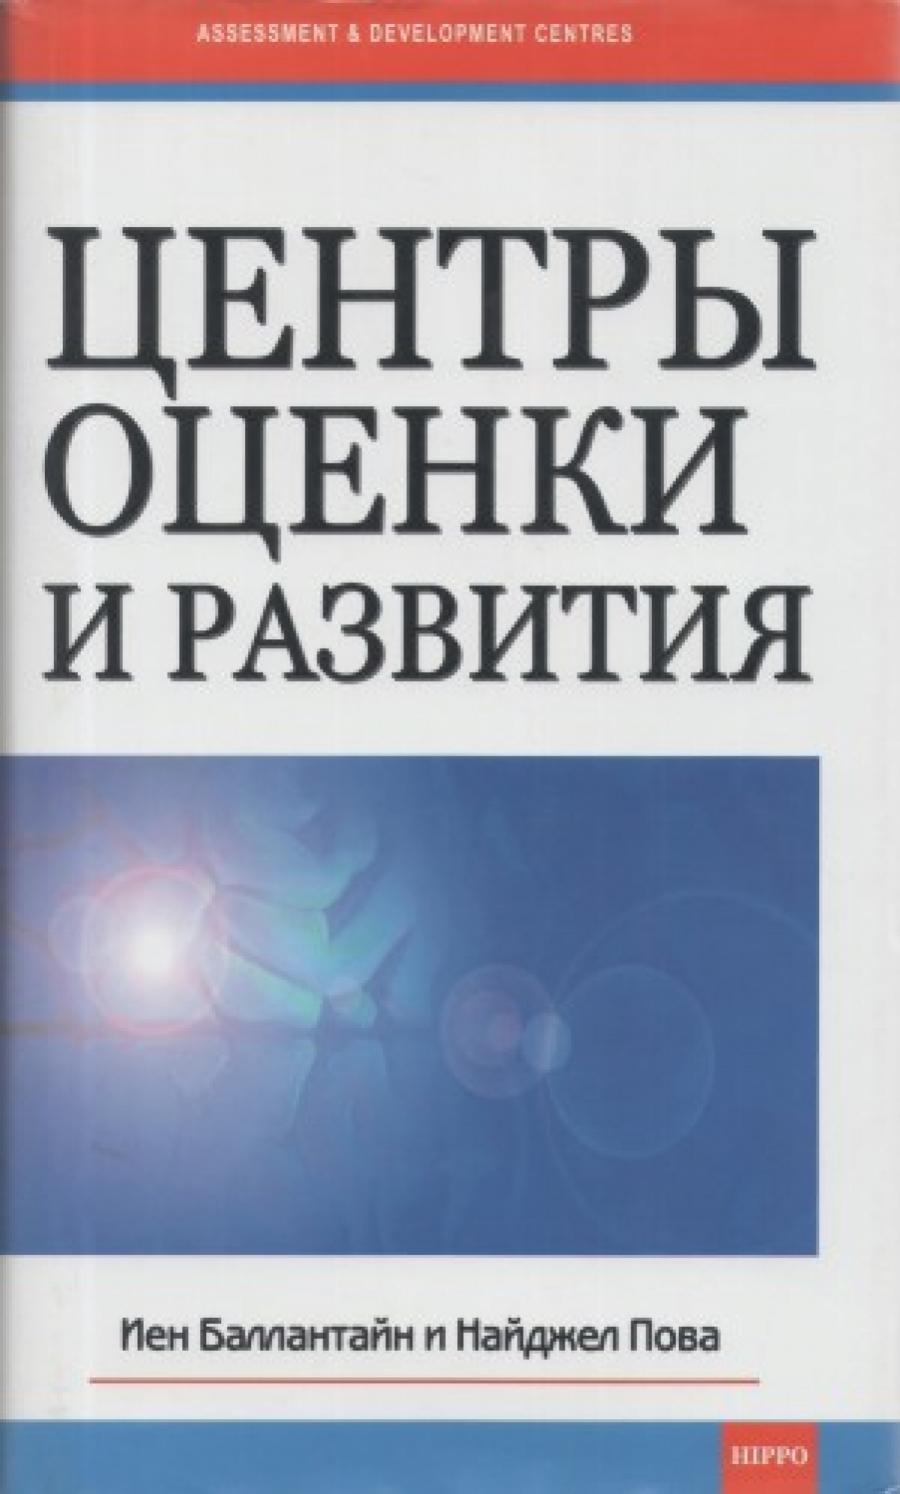 Обложка книги:  иен баллантайн, найджел пова - центры оценки и развития